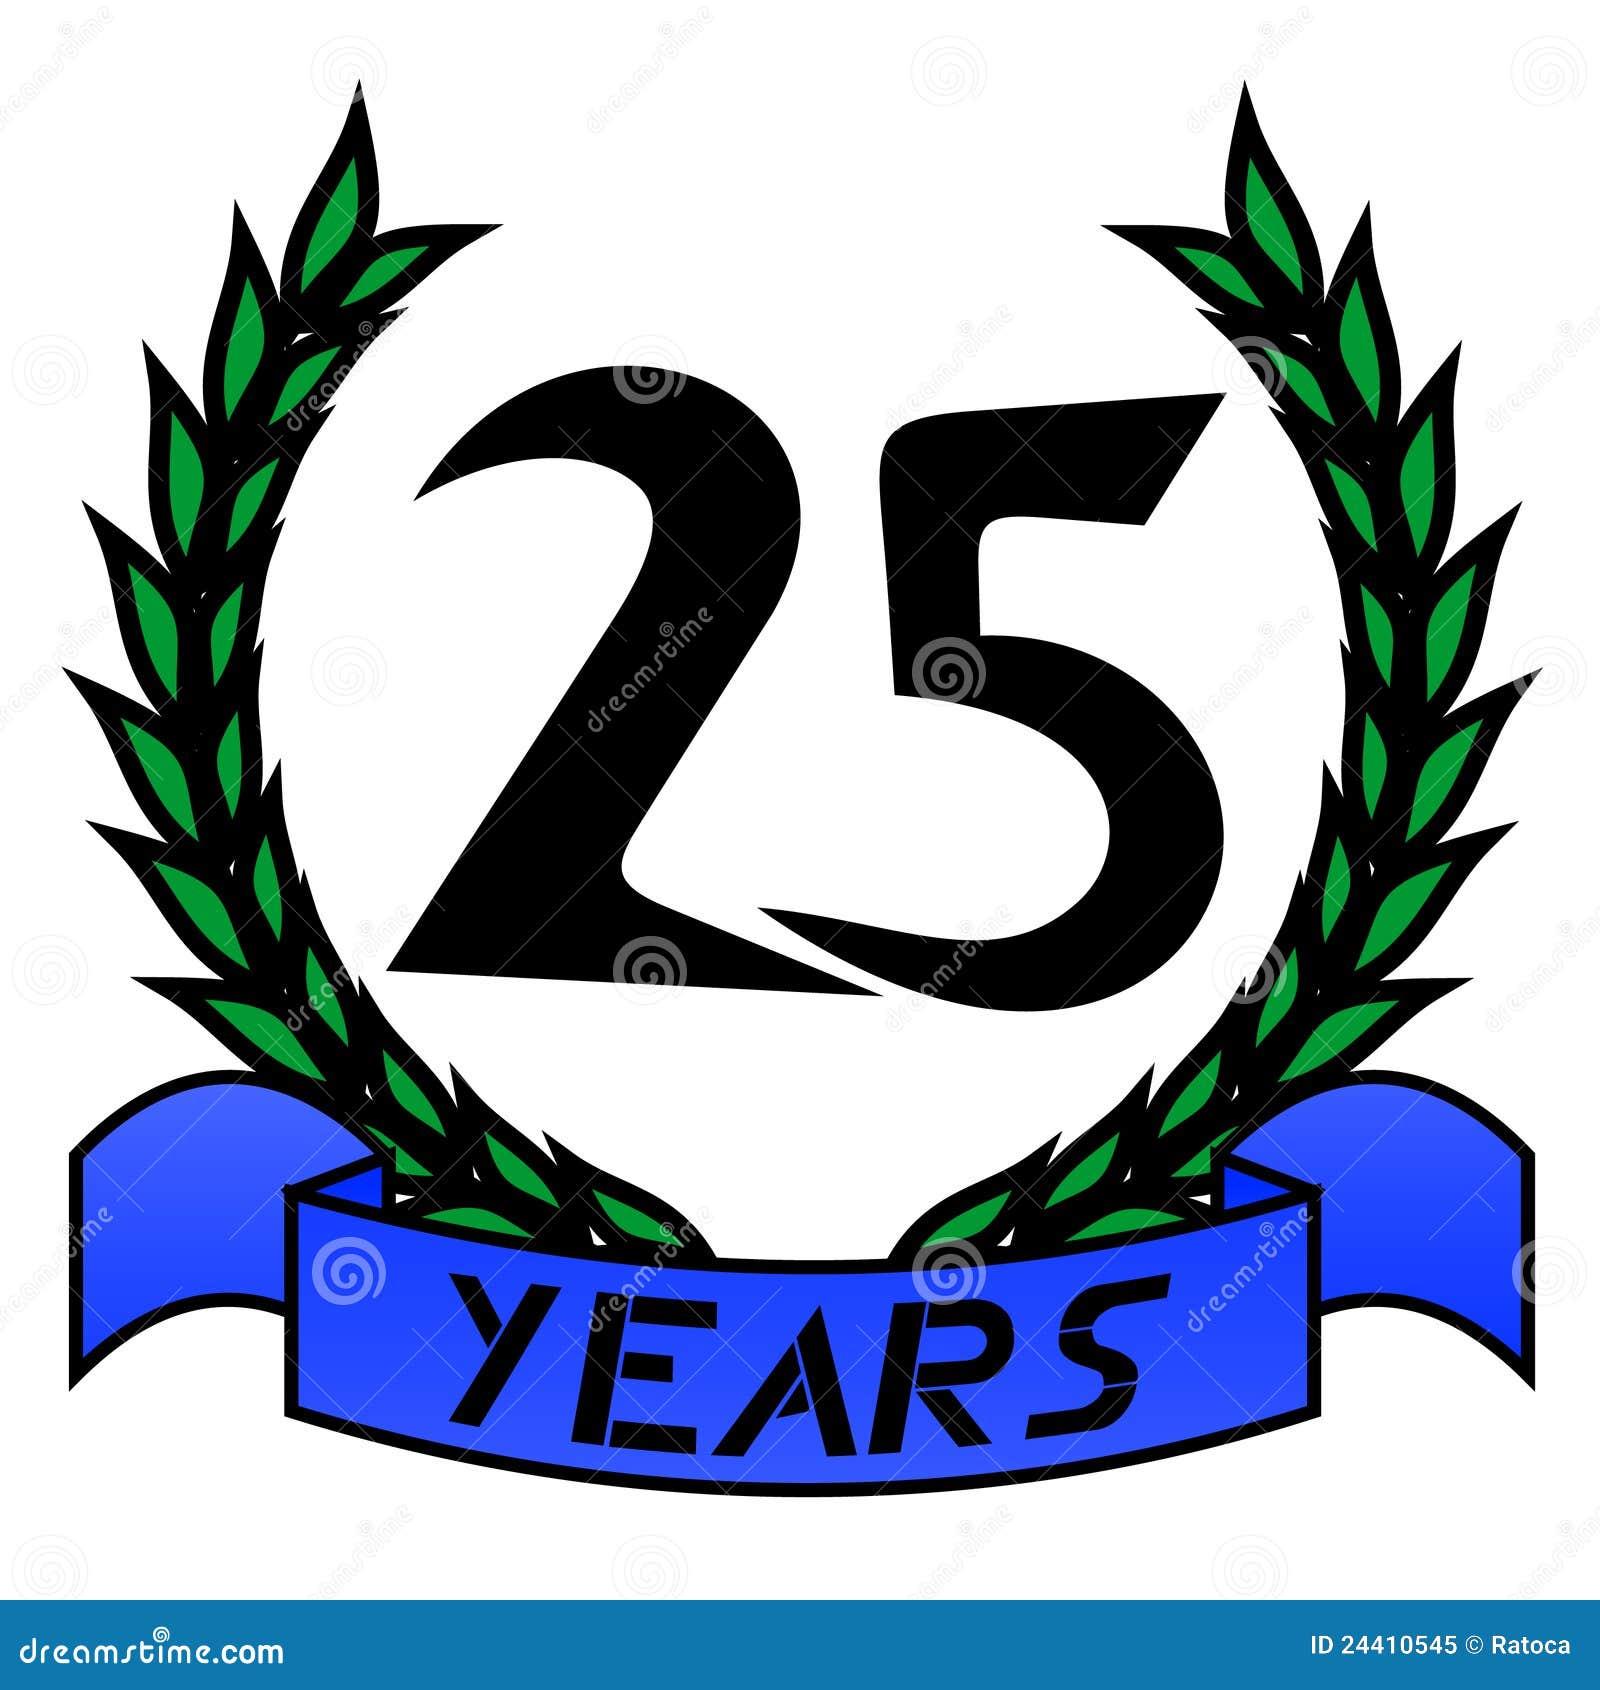 25th Anniversary Royalty Free Stock Photo - Image: 24410545